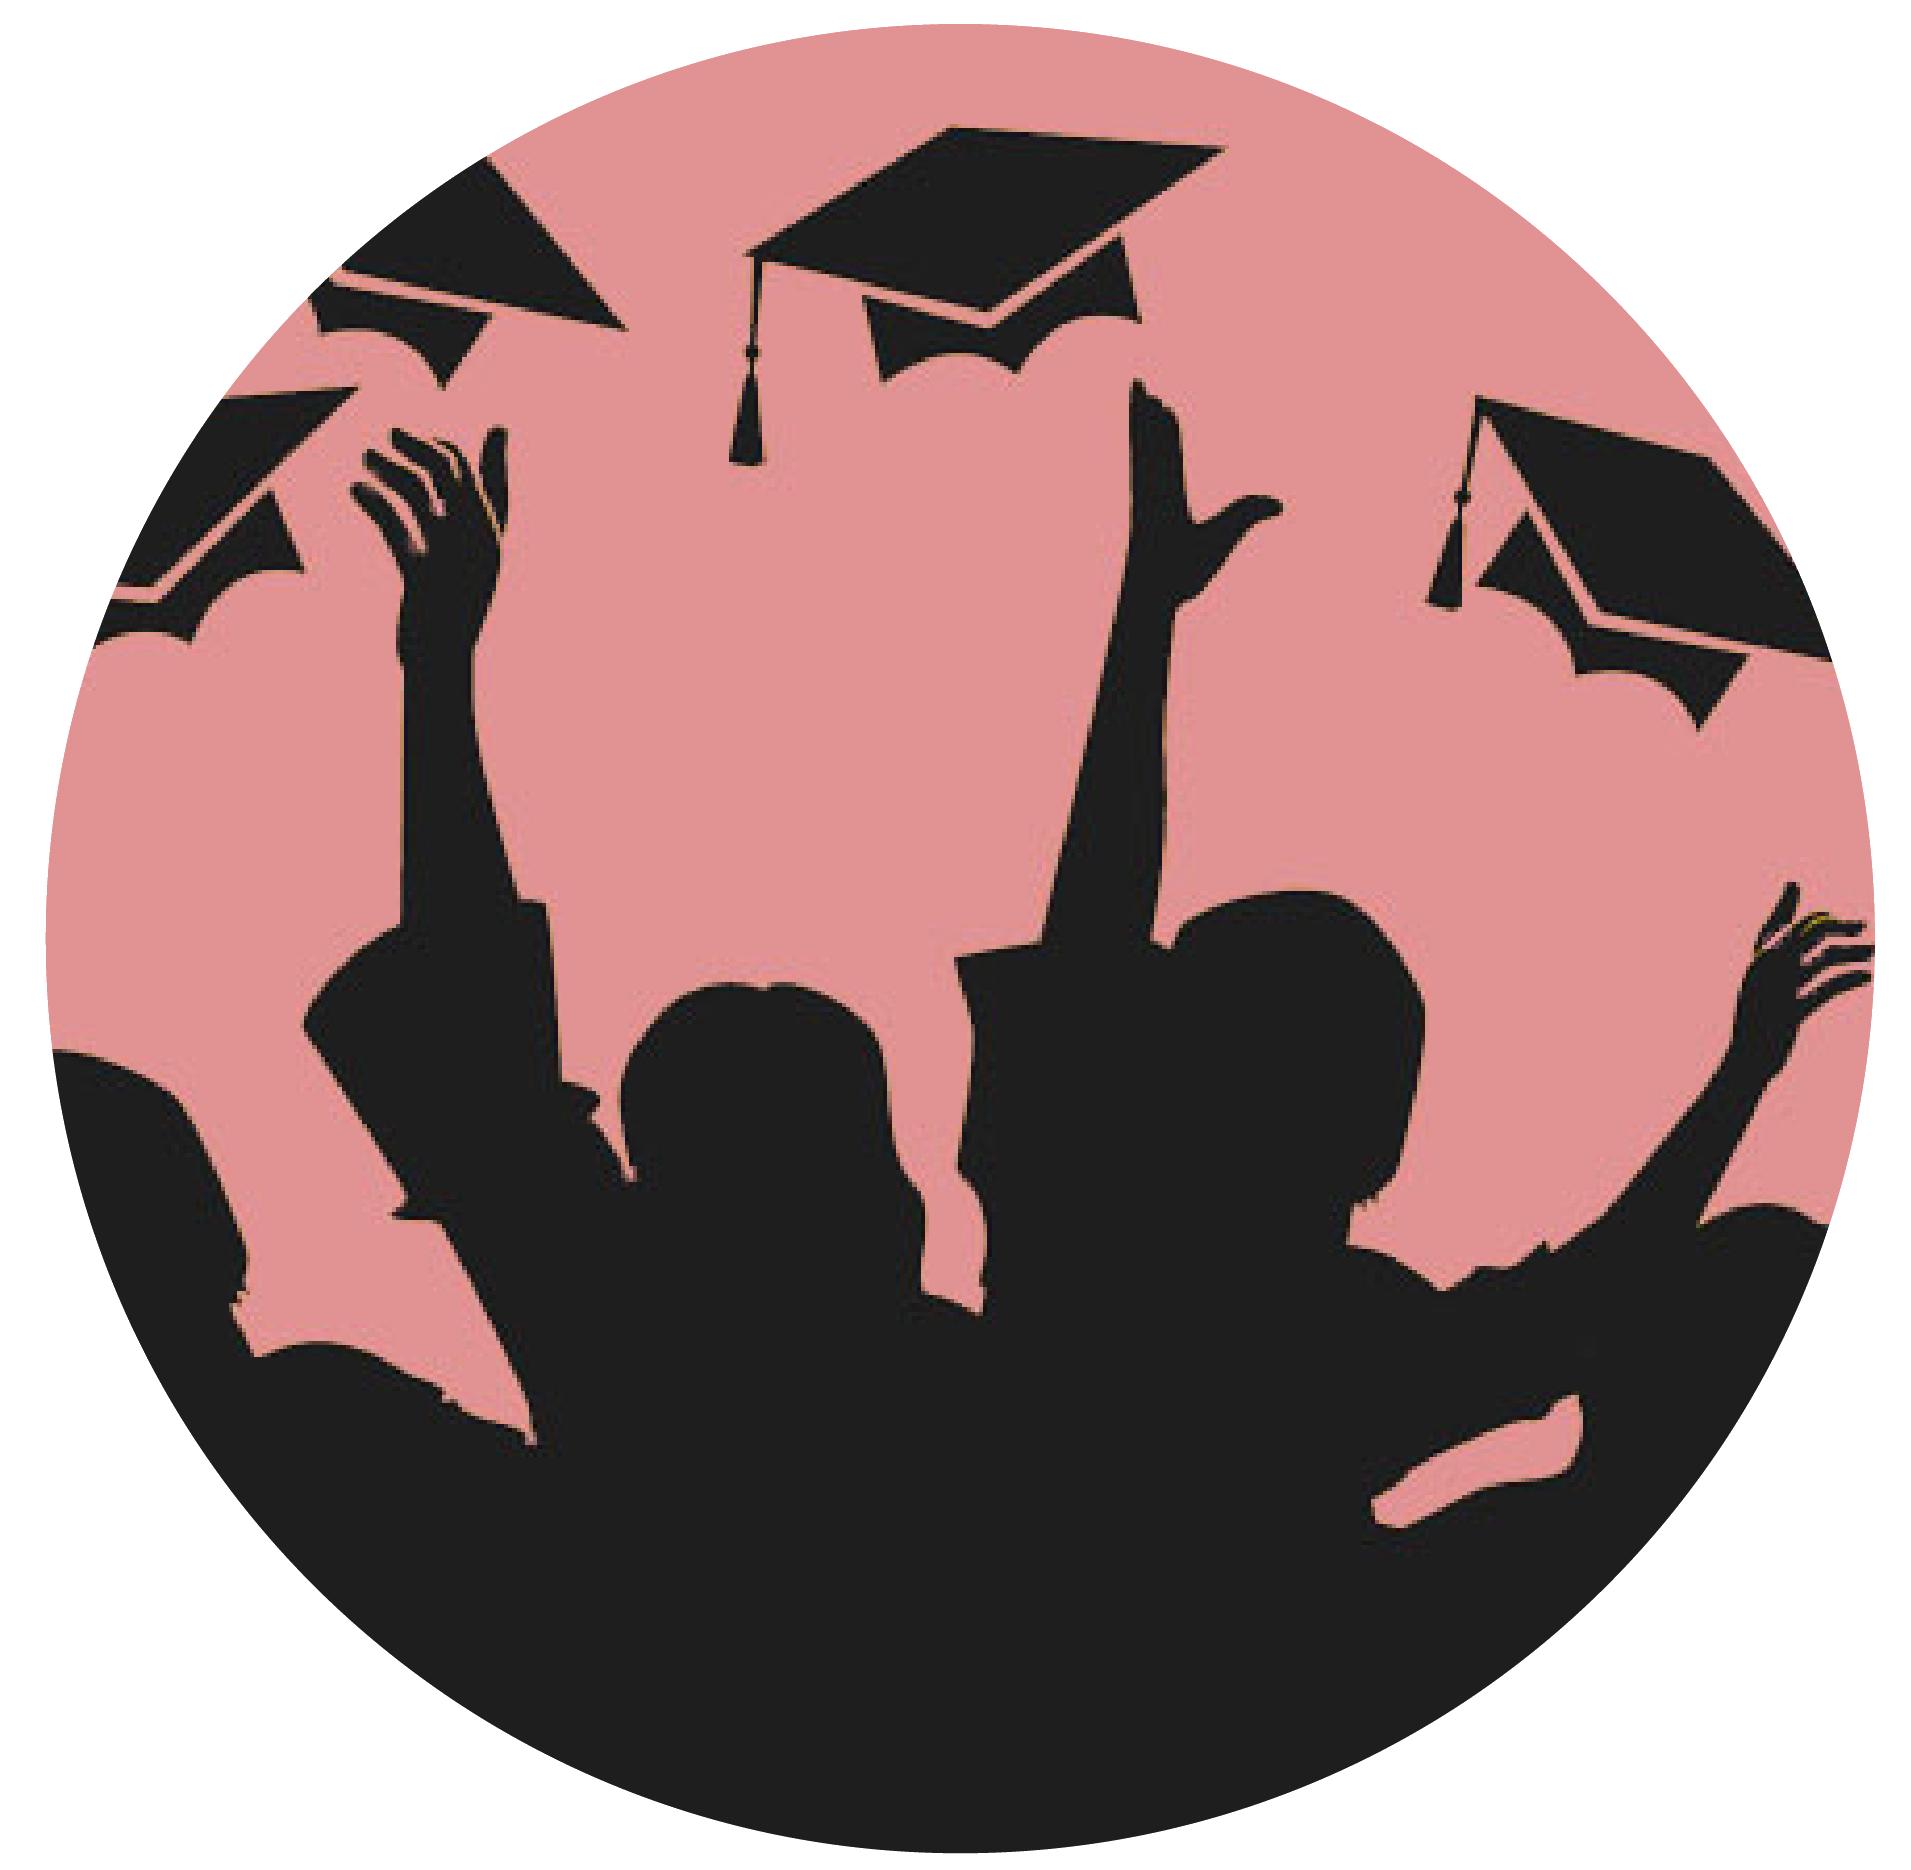 Apcf july newsletter recipients. Congratulations clipart scholarship recipient